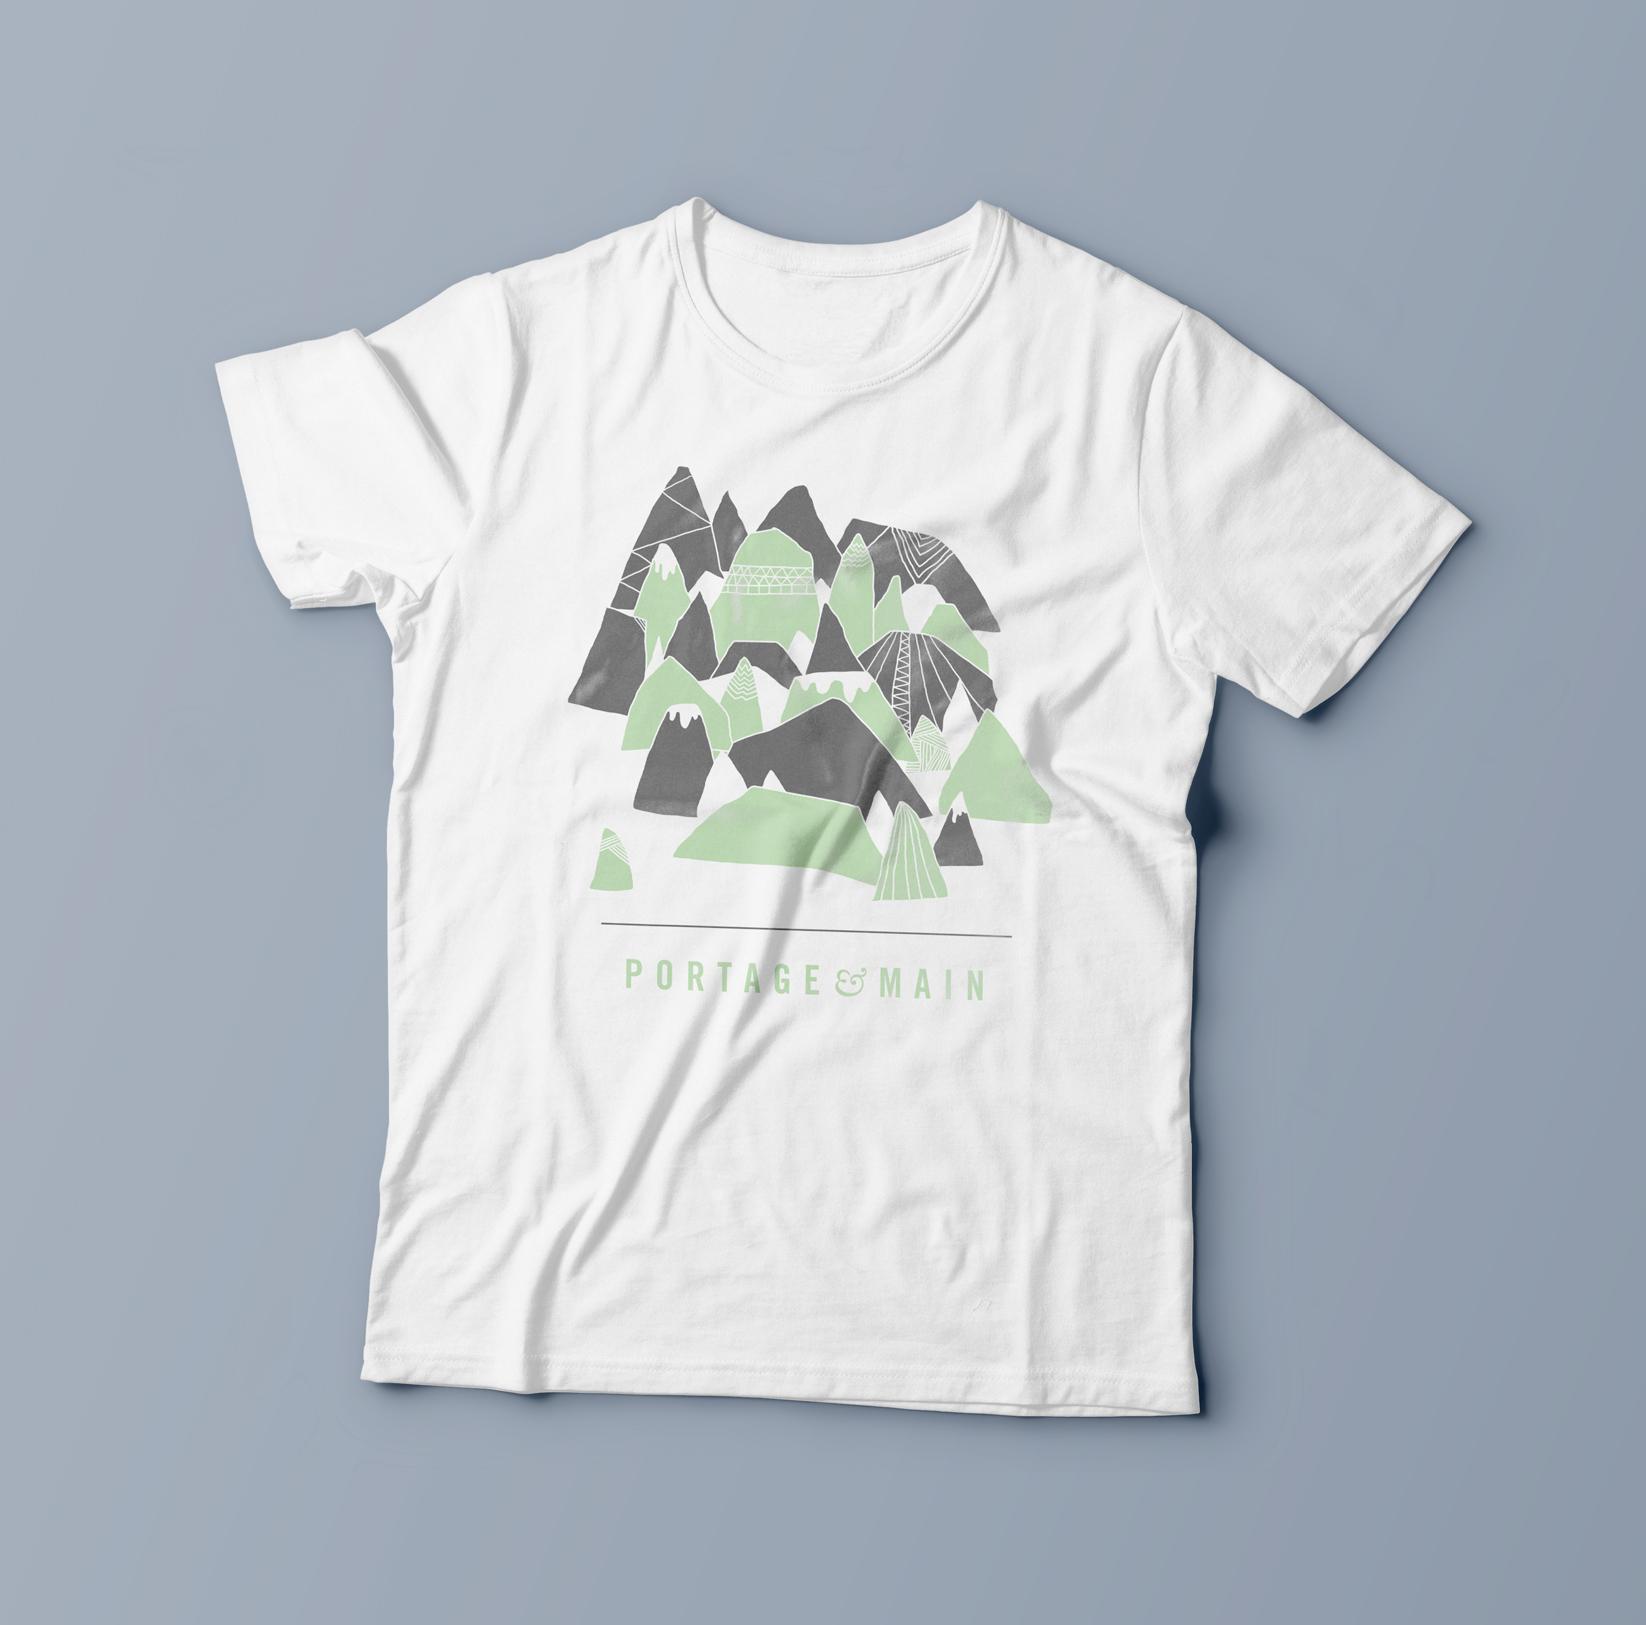 portage_shirt.jpg